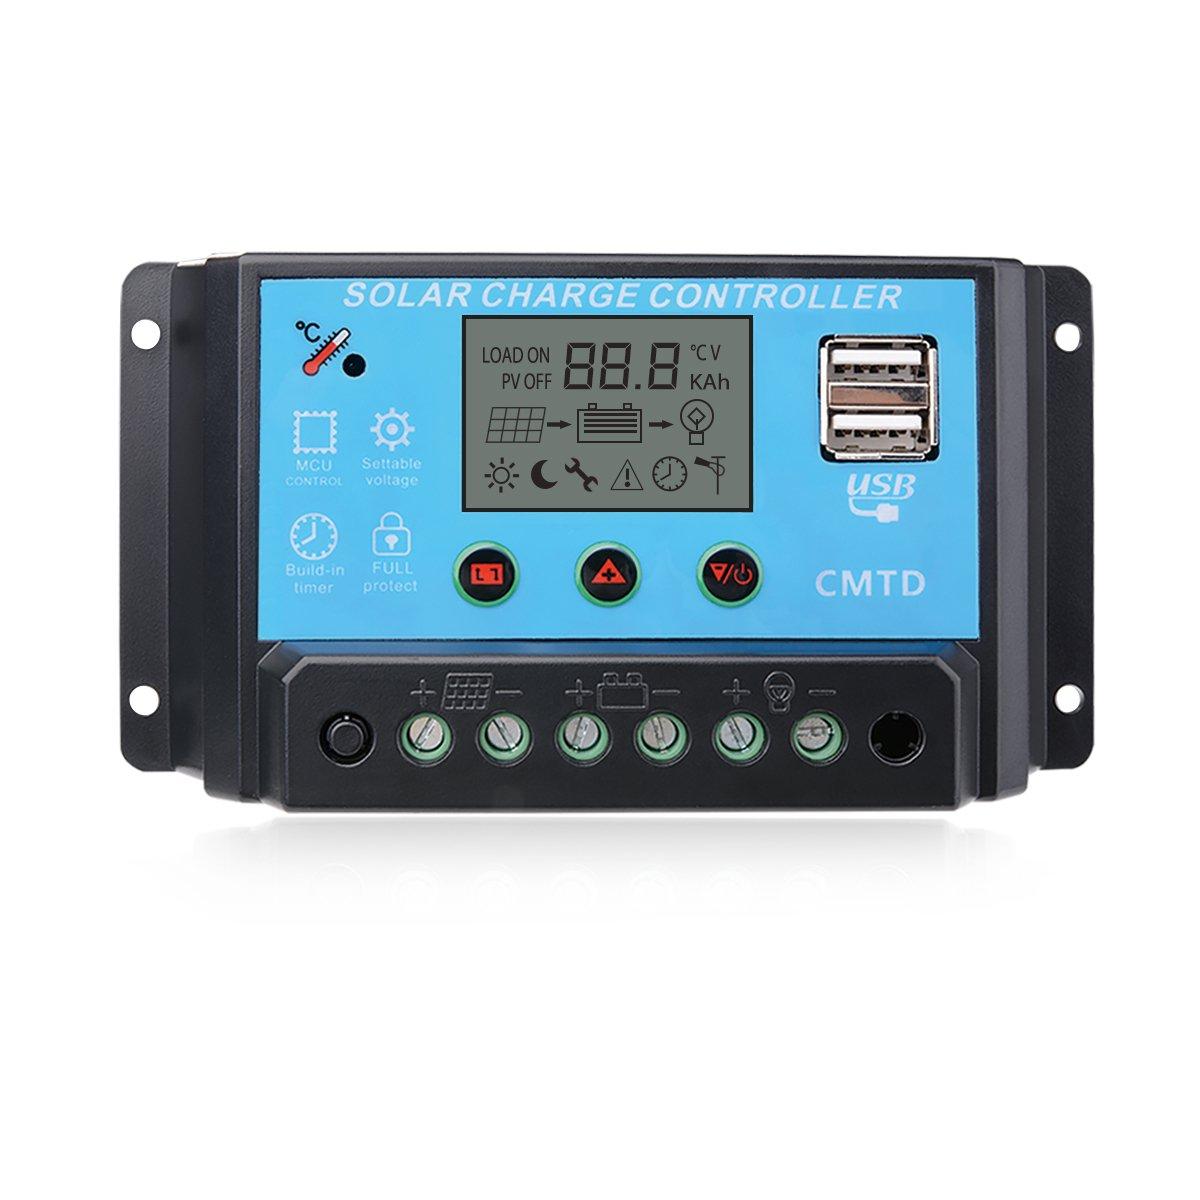 Sunix 20A 12V/24V Solar Charge Controller Charge Regulator Intelligent, USB Port Display Overload Protection Temperature Compensation by Sunix